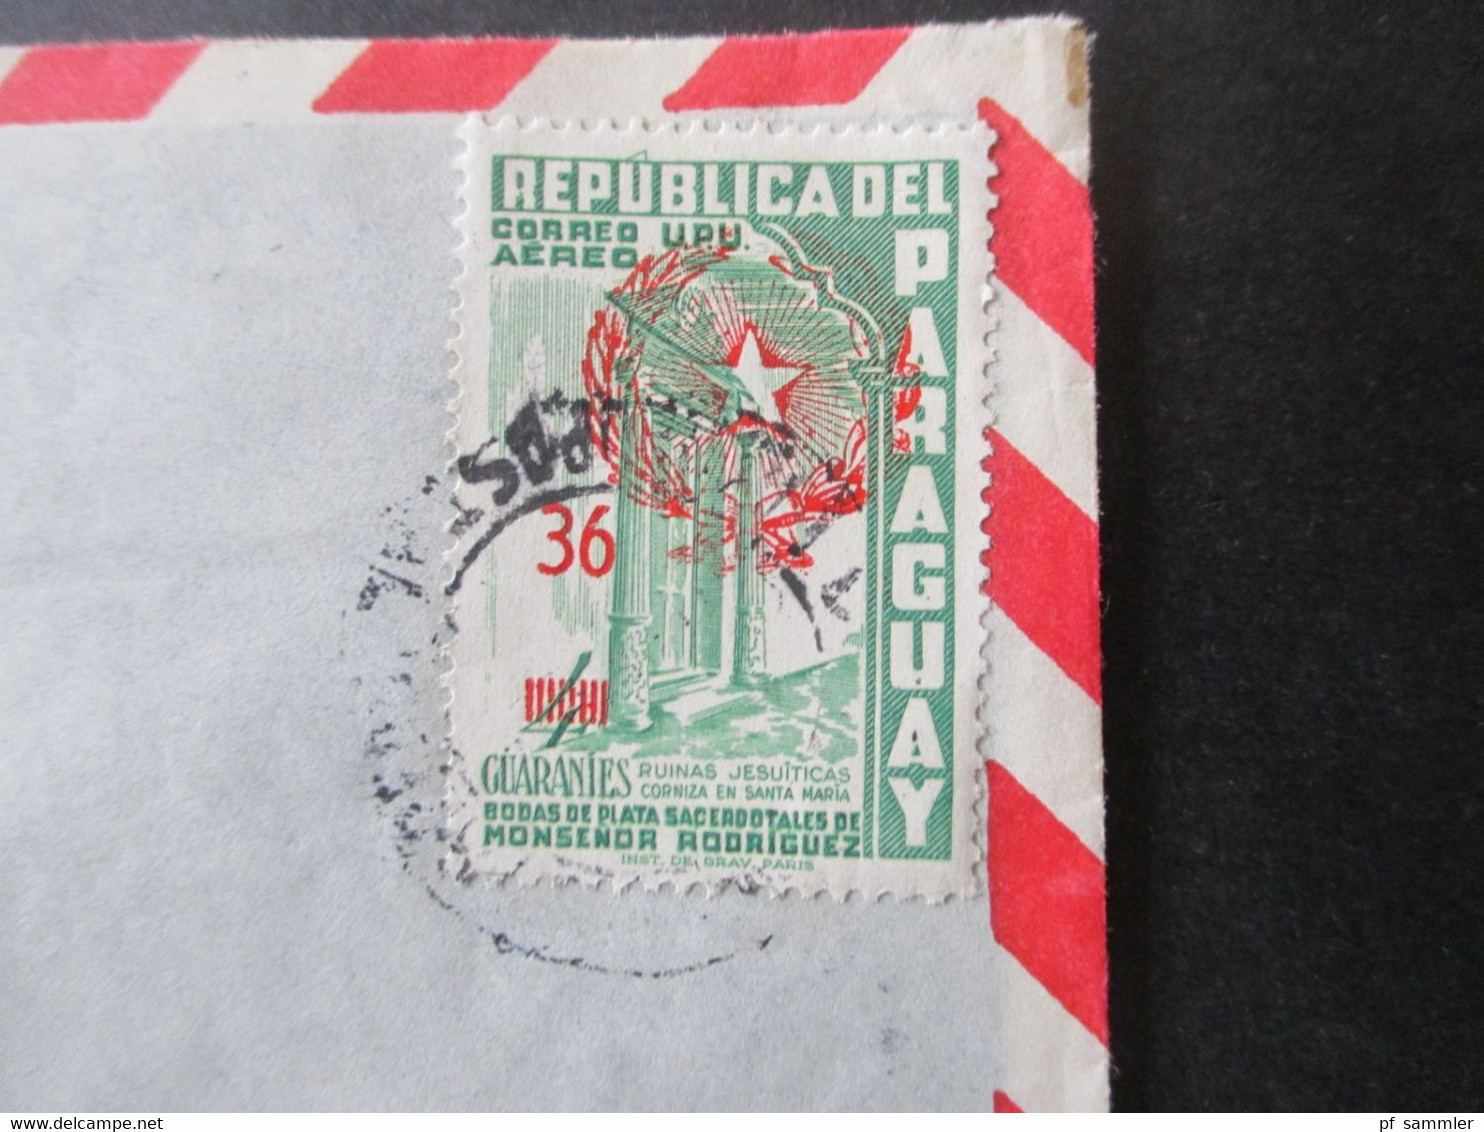 Paraguay 1959 Flugpostmarke Nr. 824 EF Luftpostbrief Domingo Scavone Asuncion Nach Mainz Gesendet - Paraguay